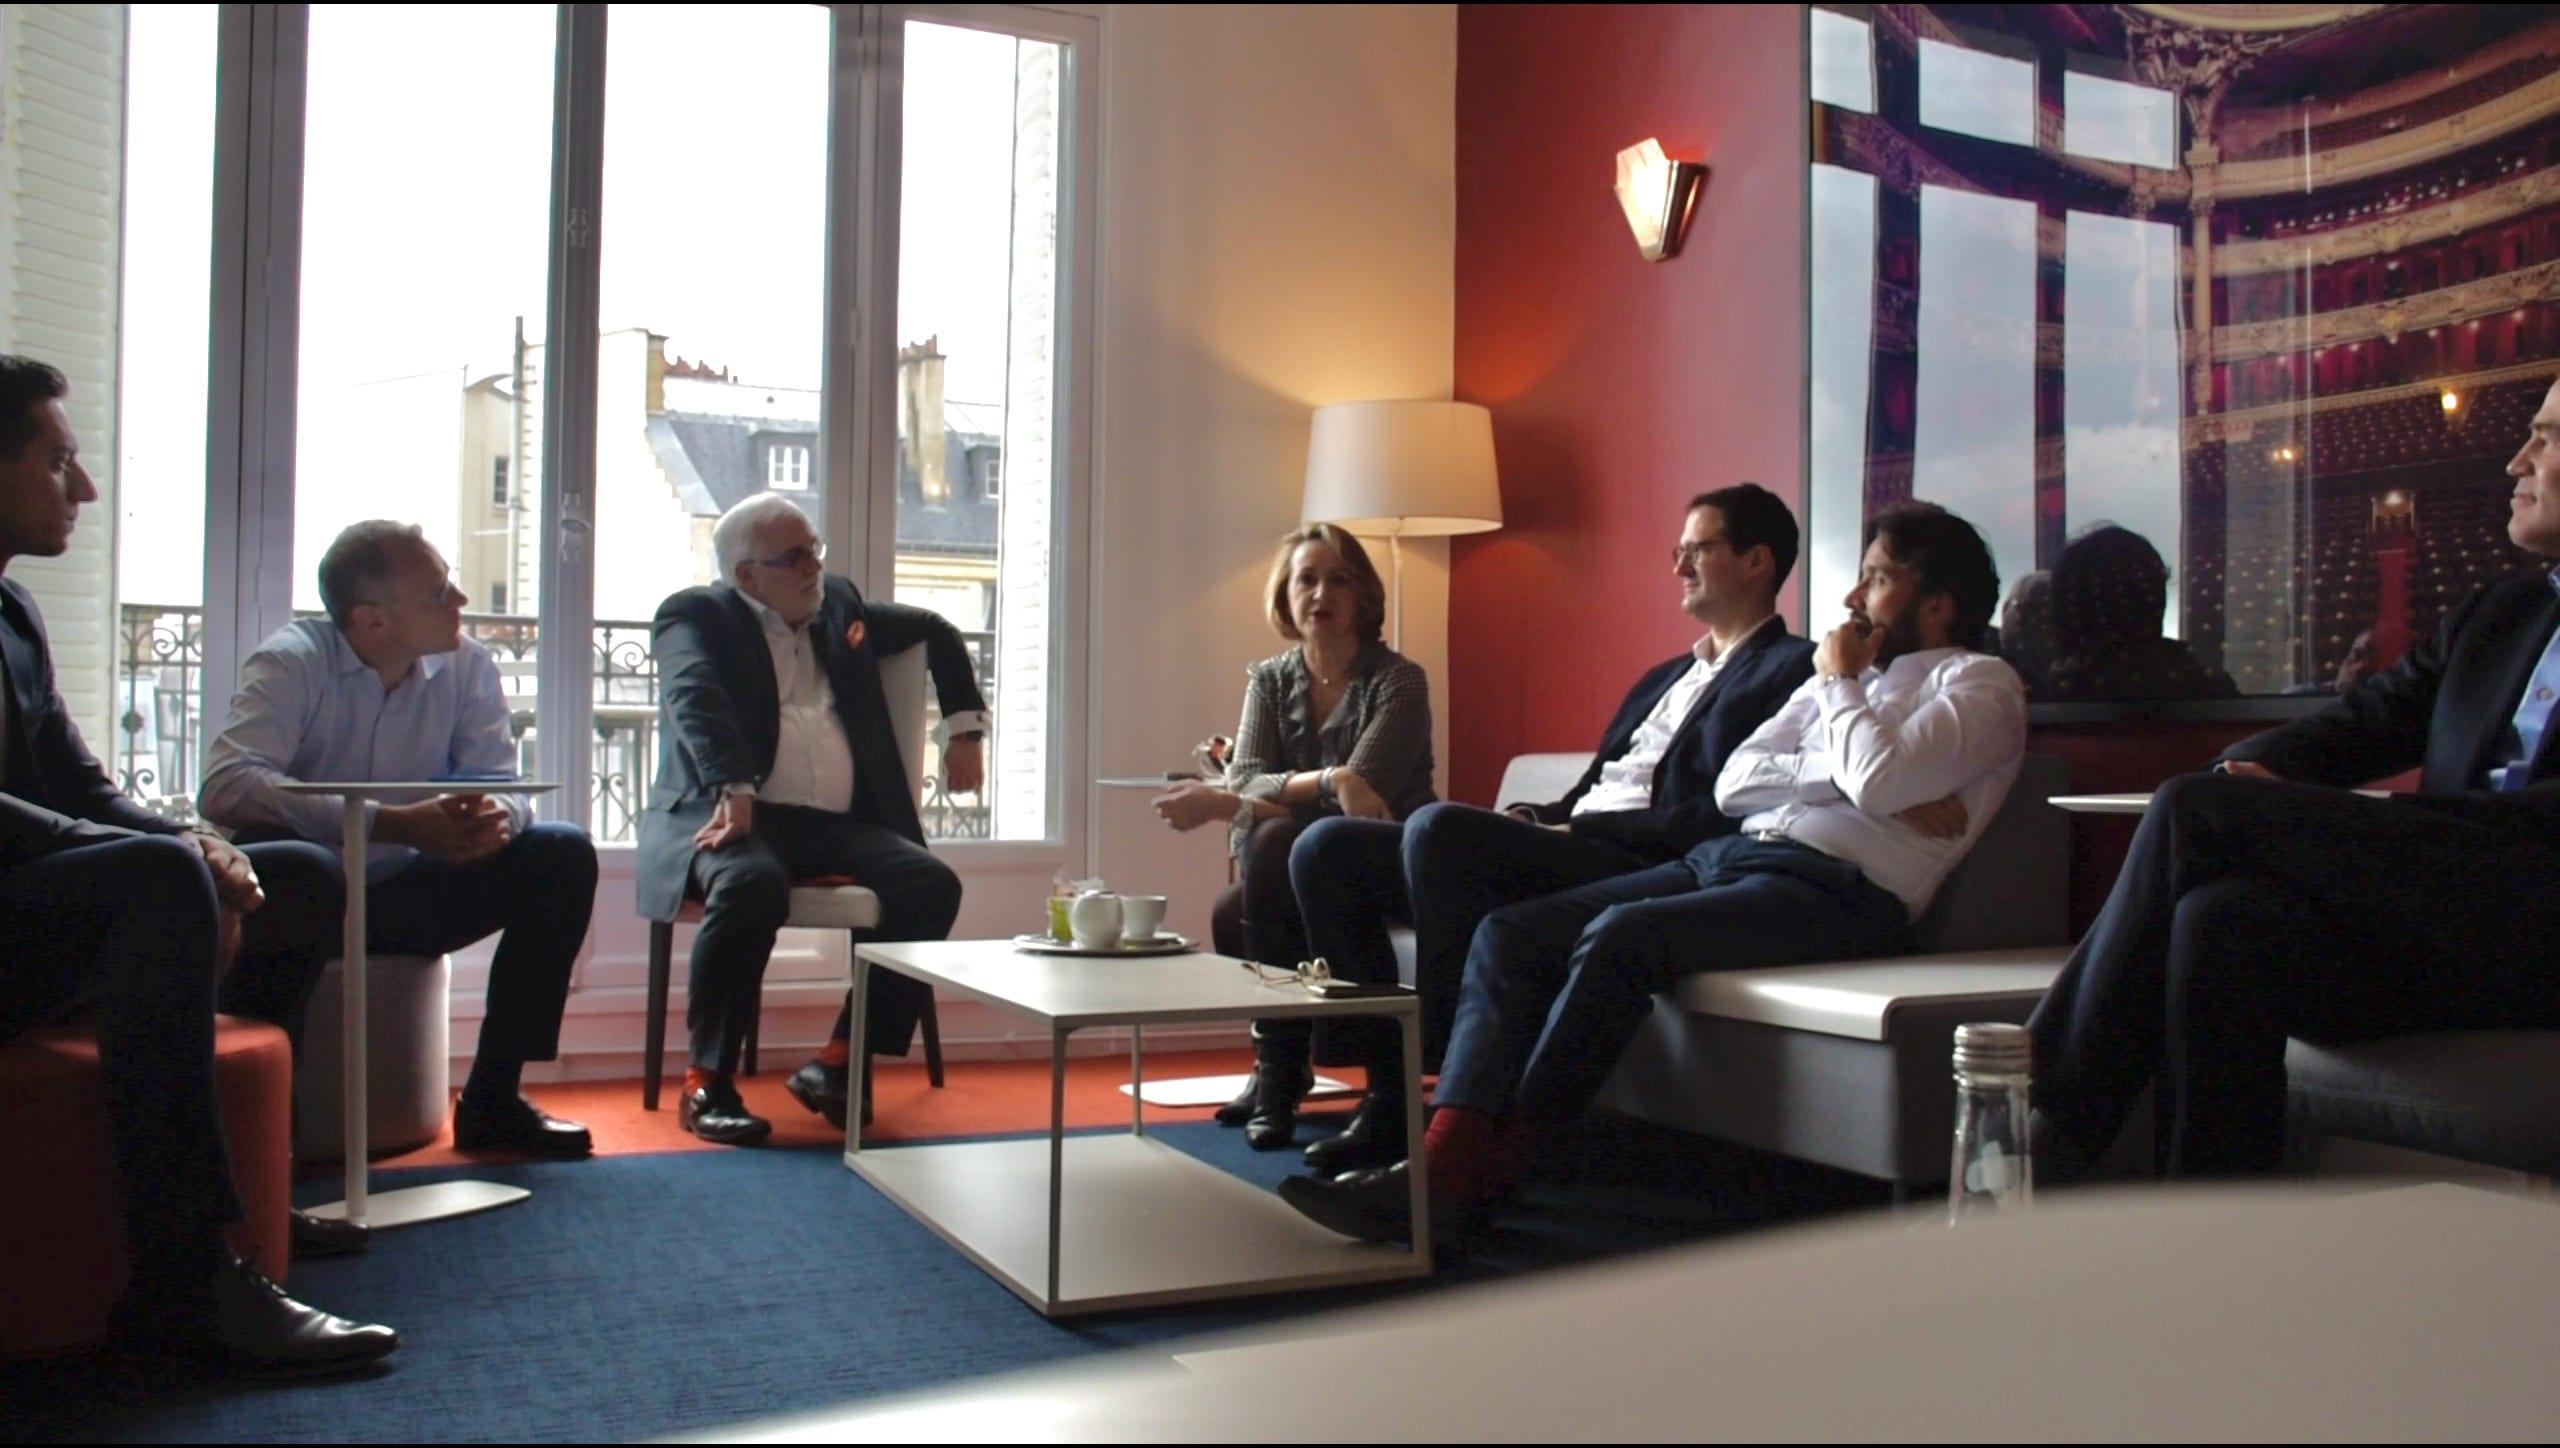 Marie-Hélène Fagard, invitée spéciale d'Arrowman Executive Search